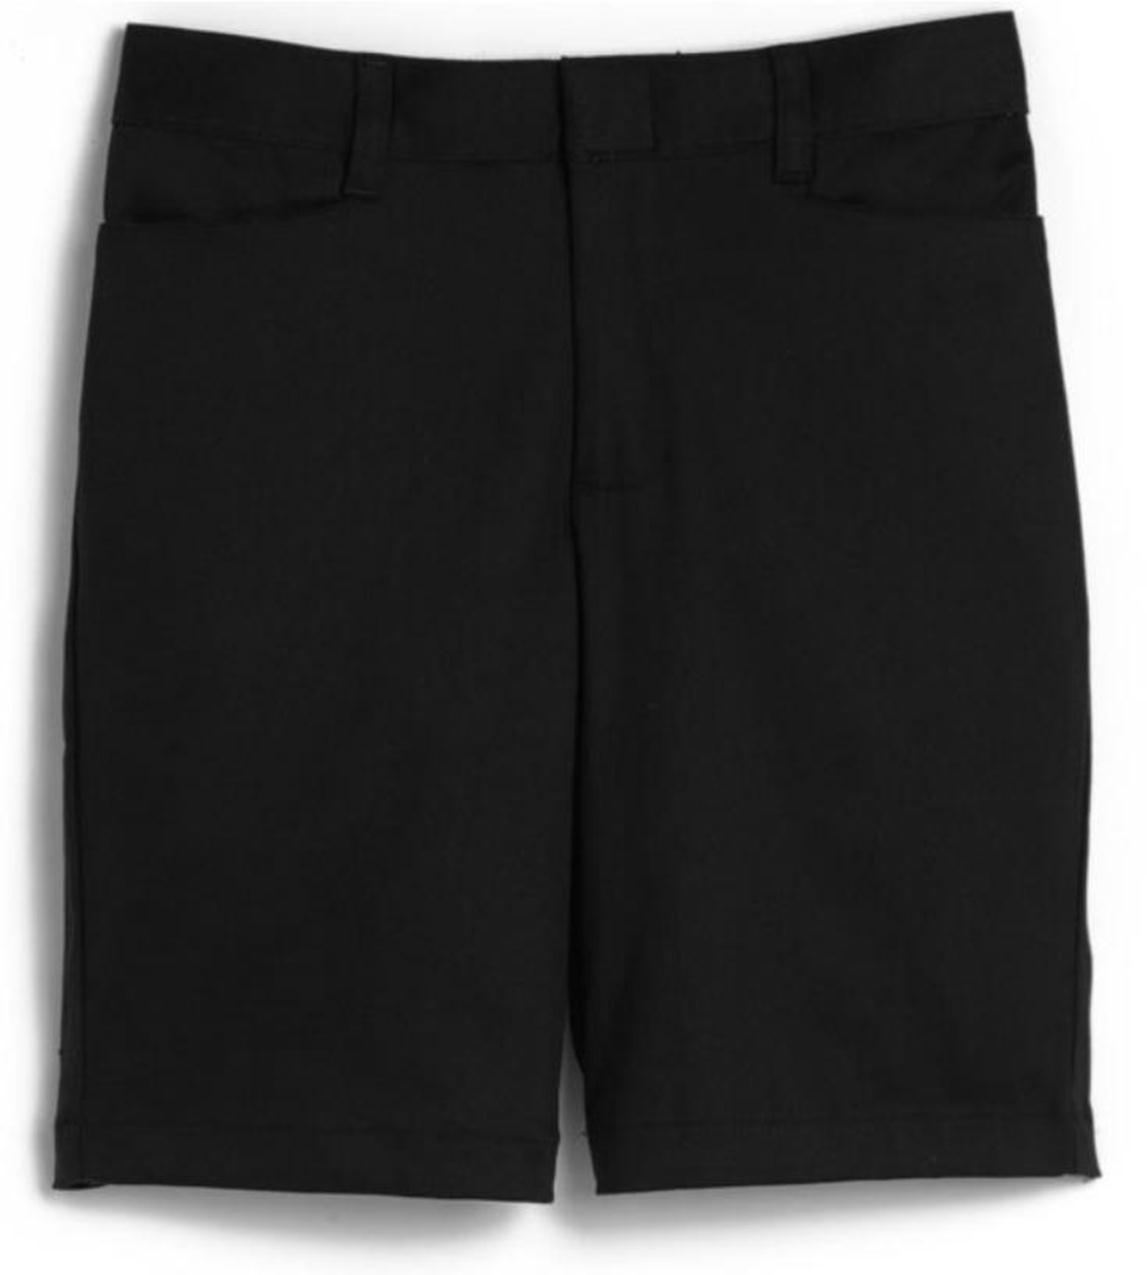 Girls Mid-Rise Bermuda Shorts - Stretch - Flat Front - #2444 - Black